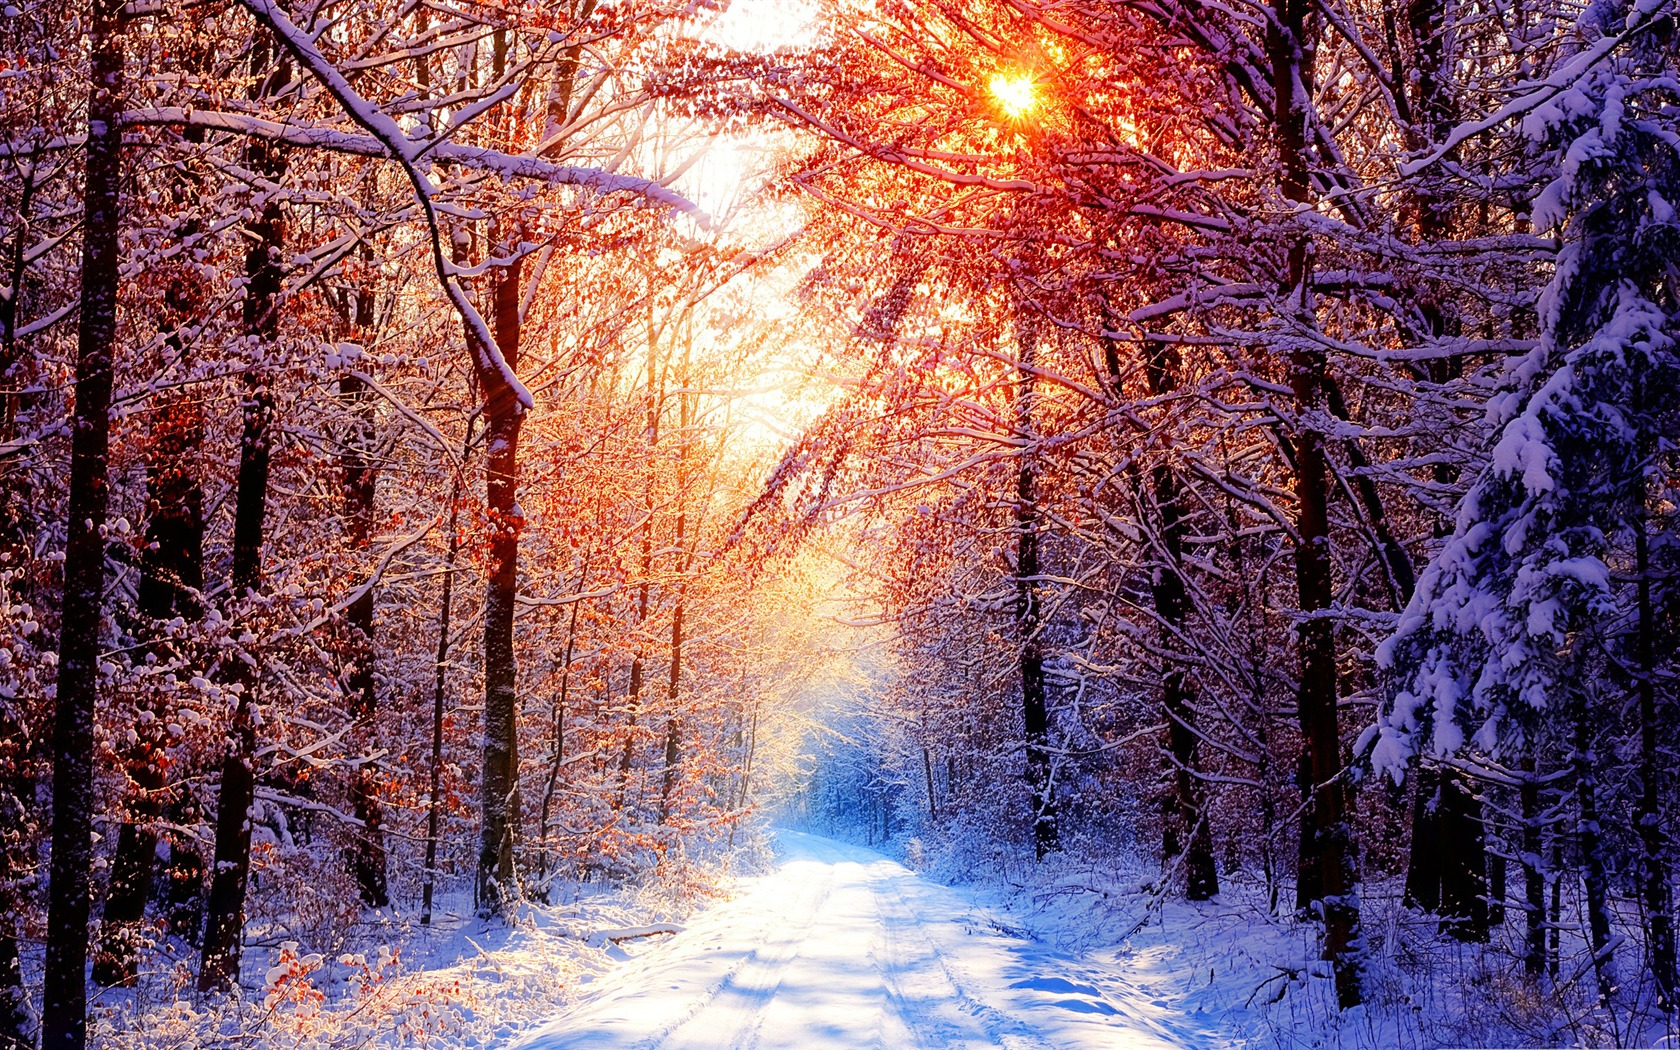 Winter Scenes-the Cold Winter Landscape Desktop-1680x1050